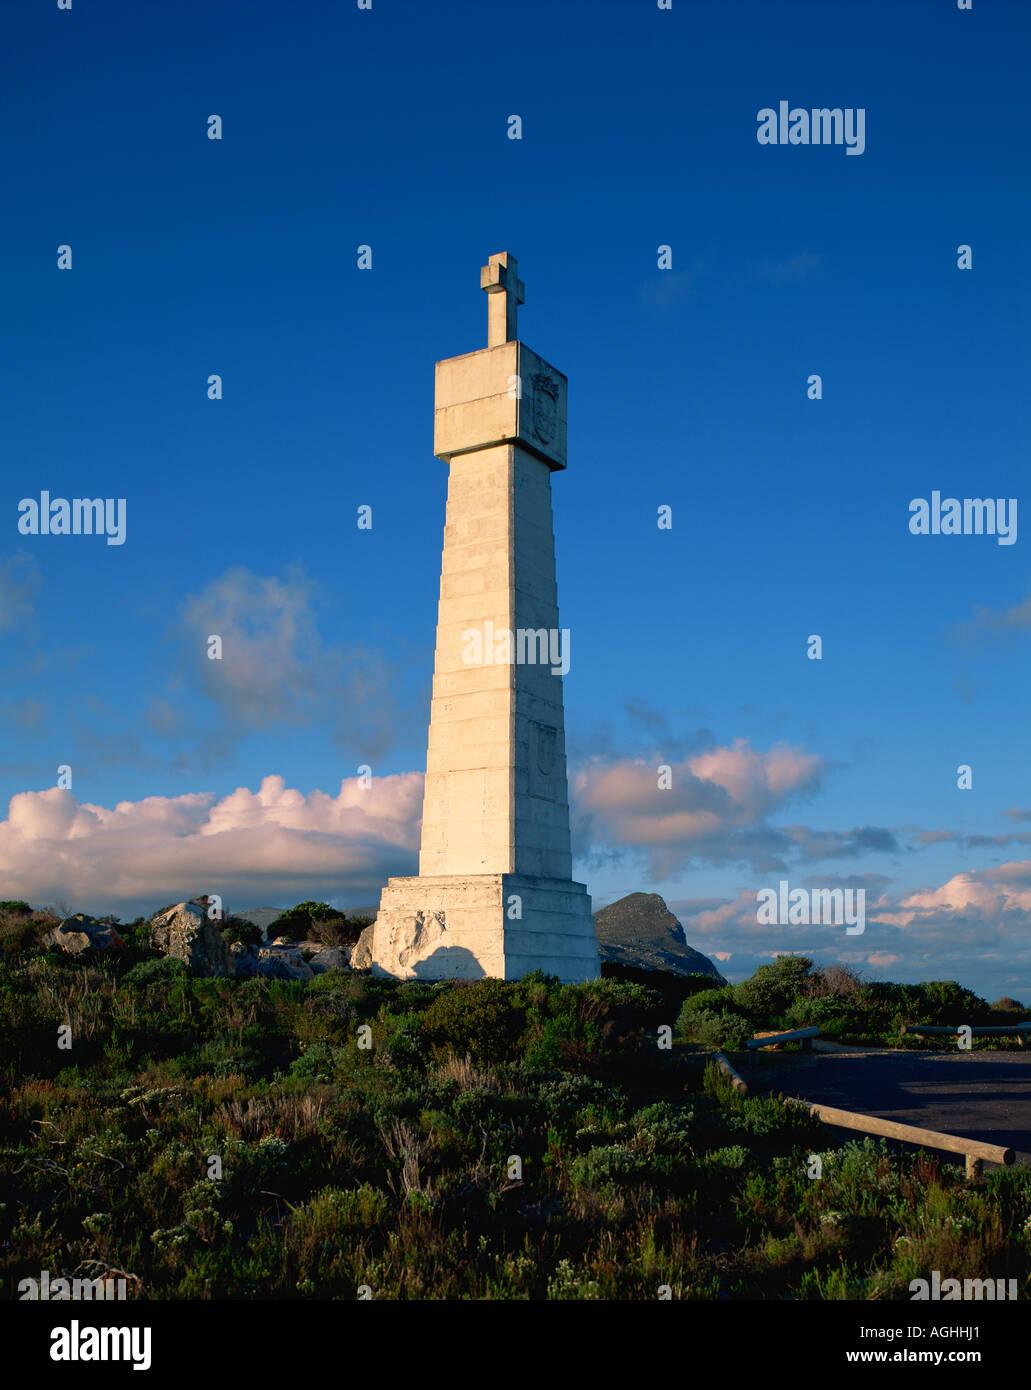 South Africa Cape Peninsula Bartholomieu Dias Monument - Stock Image